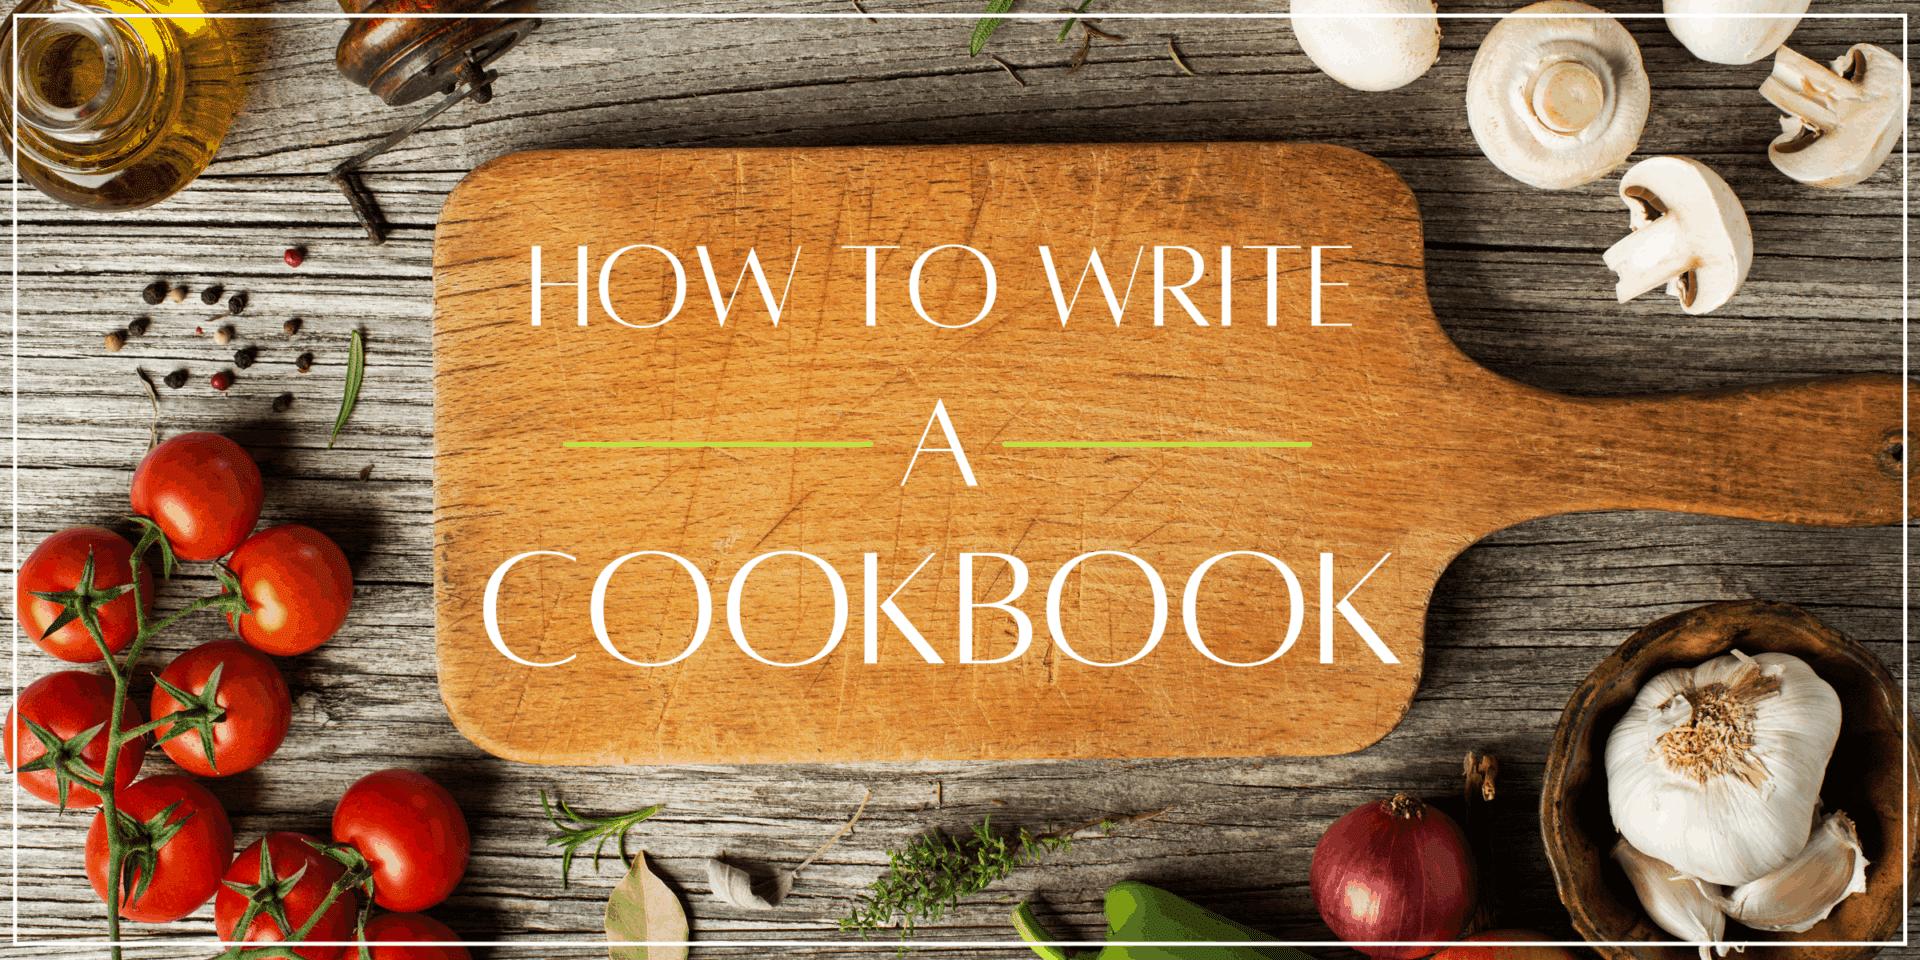 How To Write a Cookbook